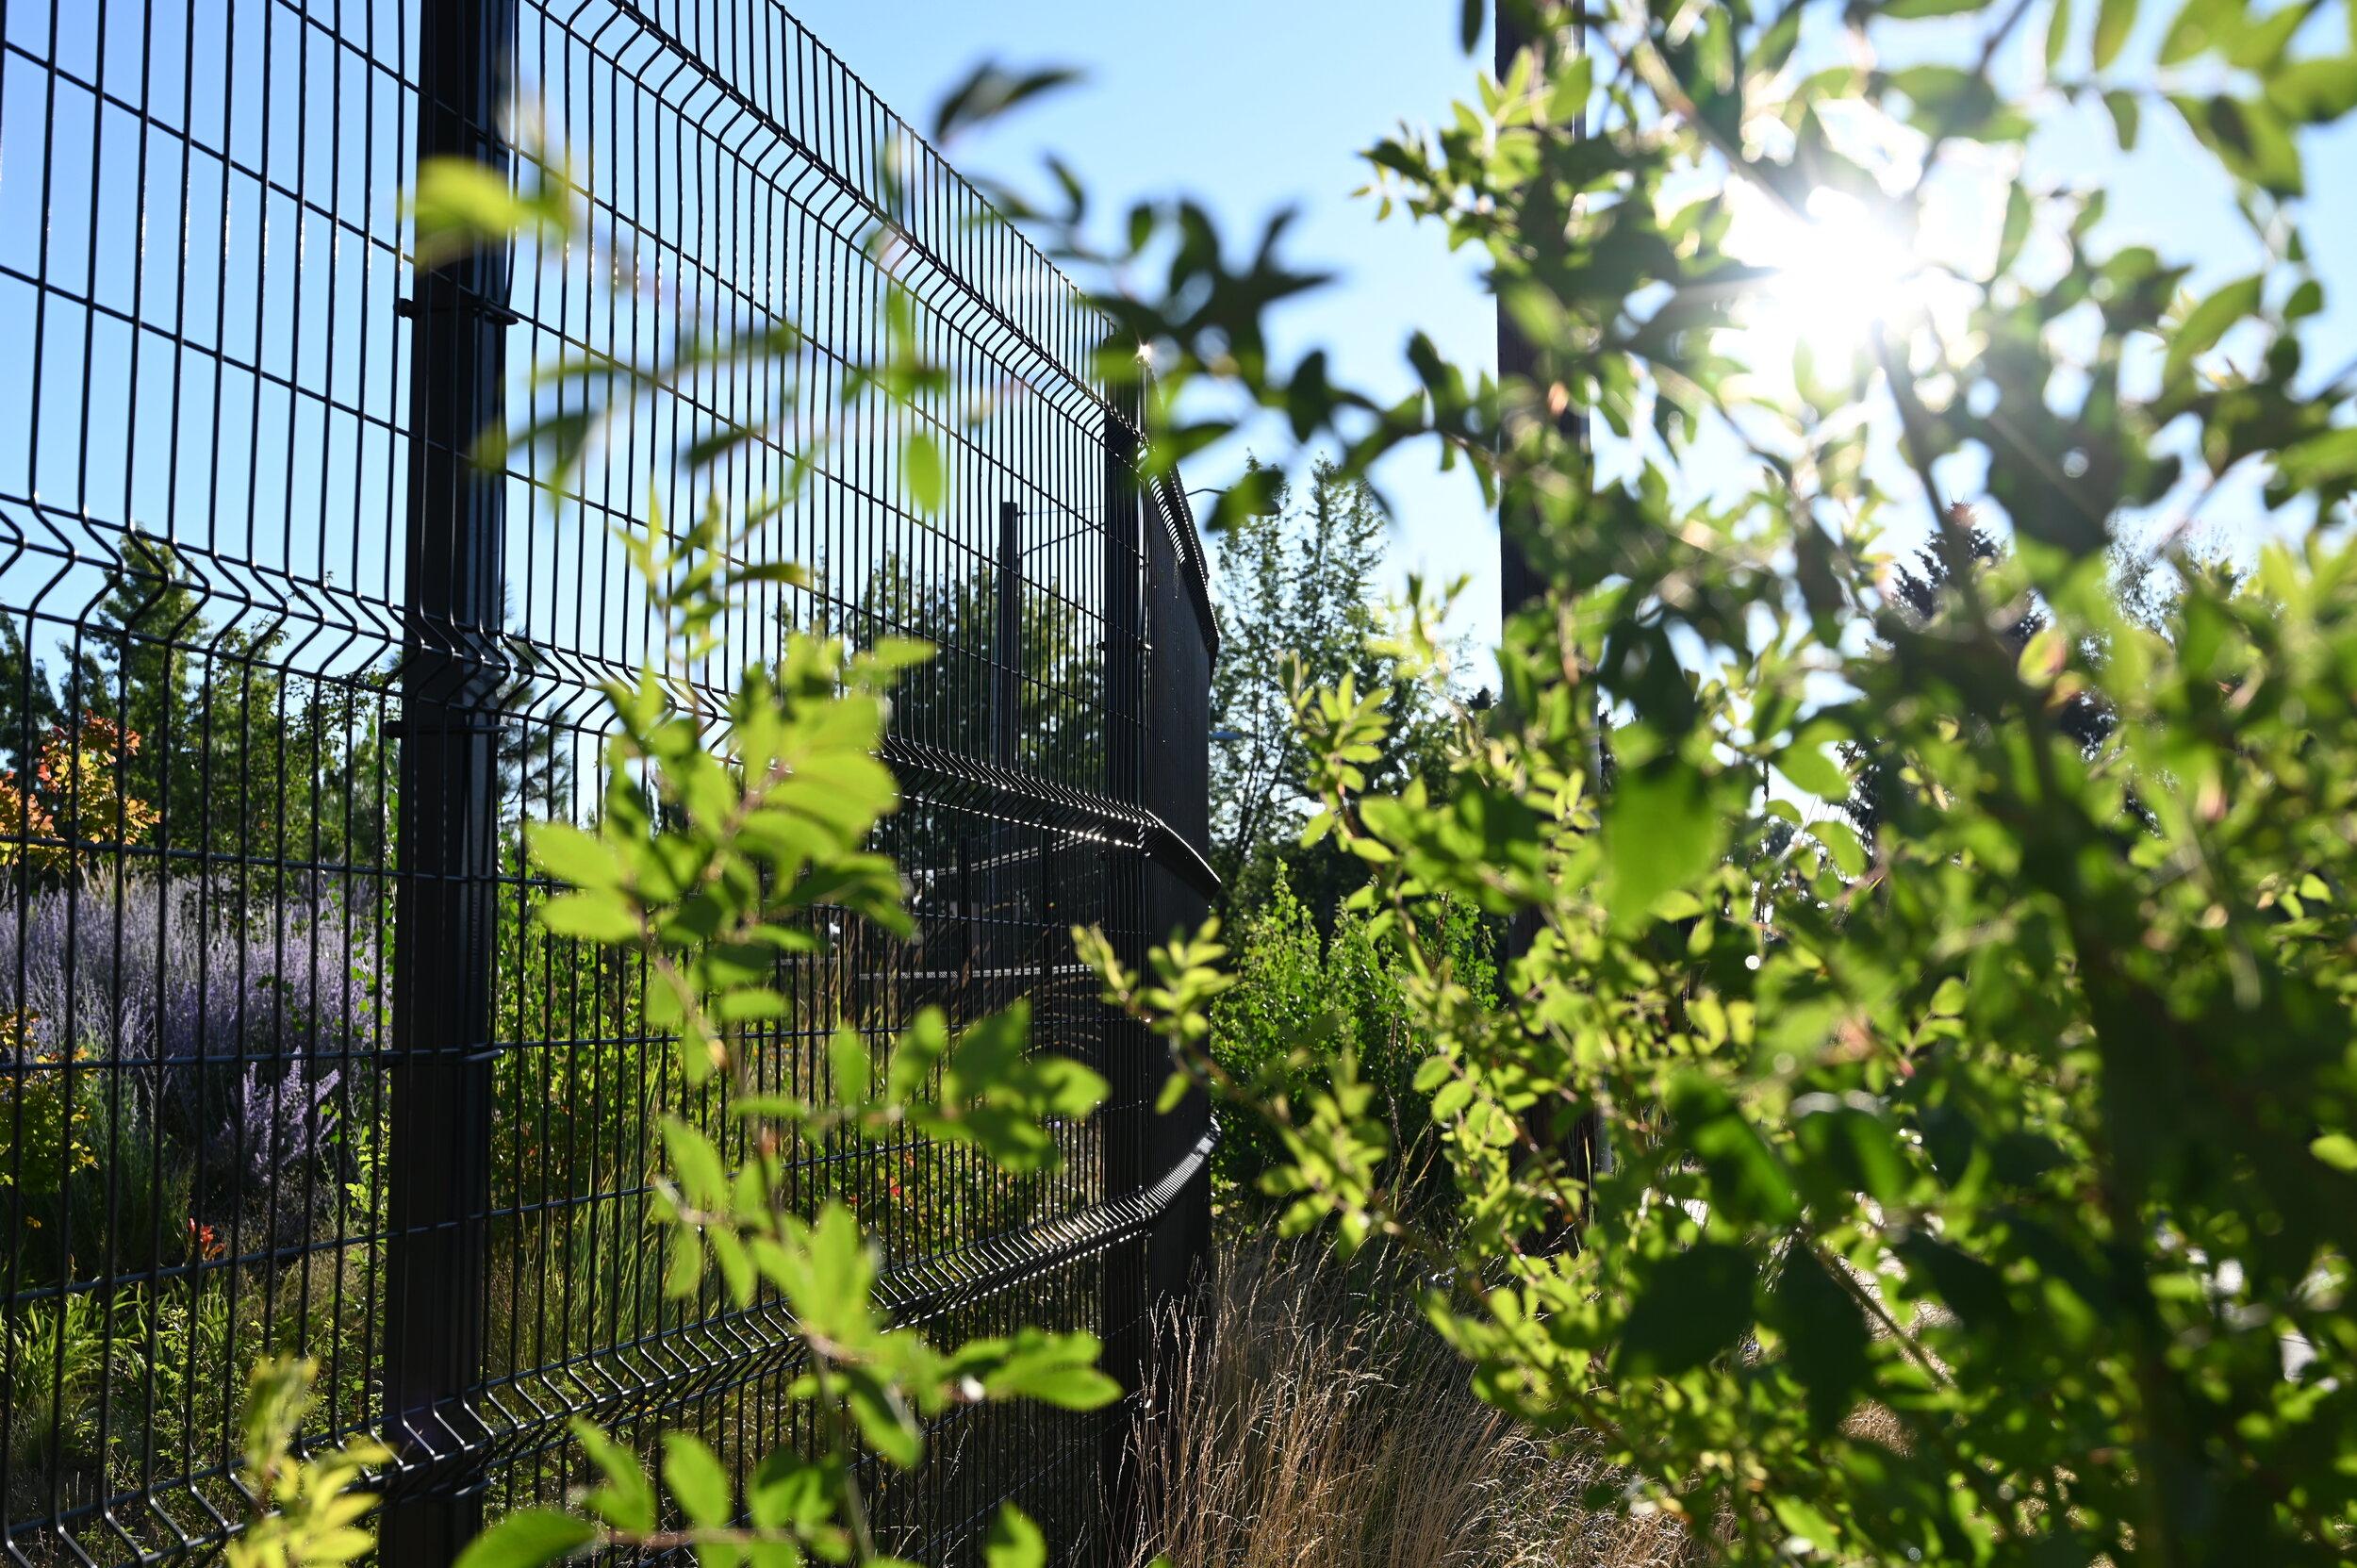 metal_grid_fence_plants.JPG